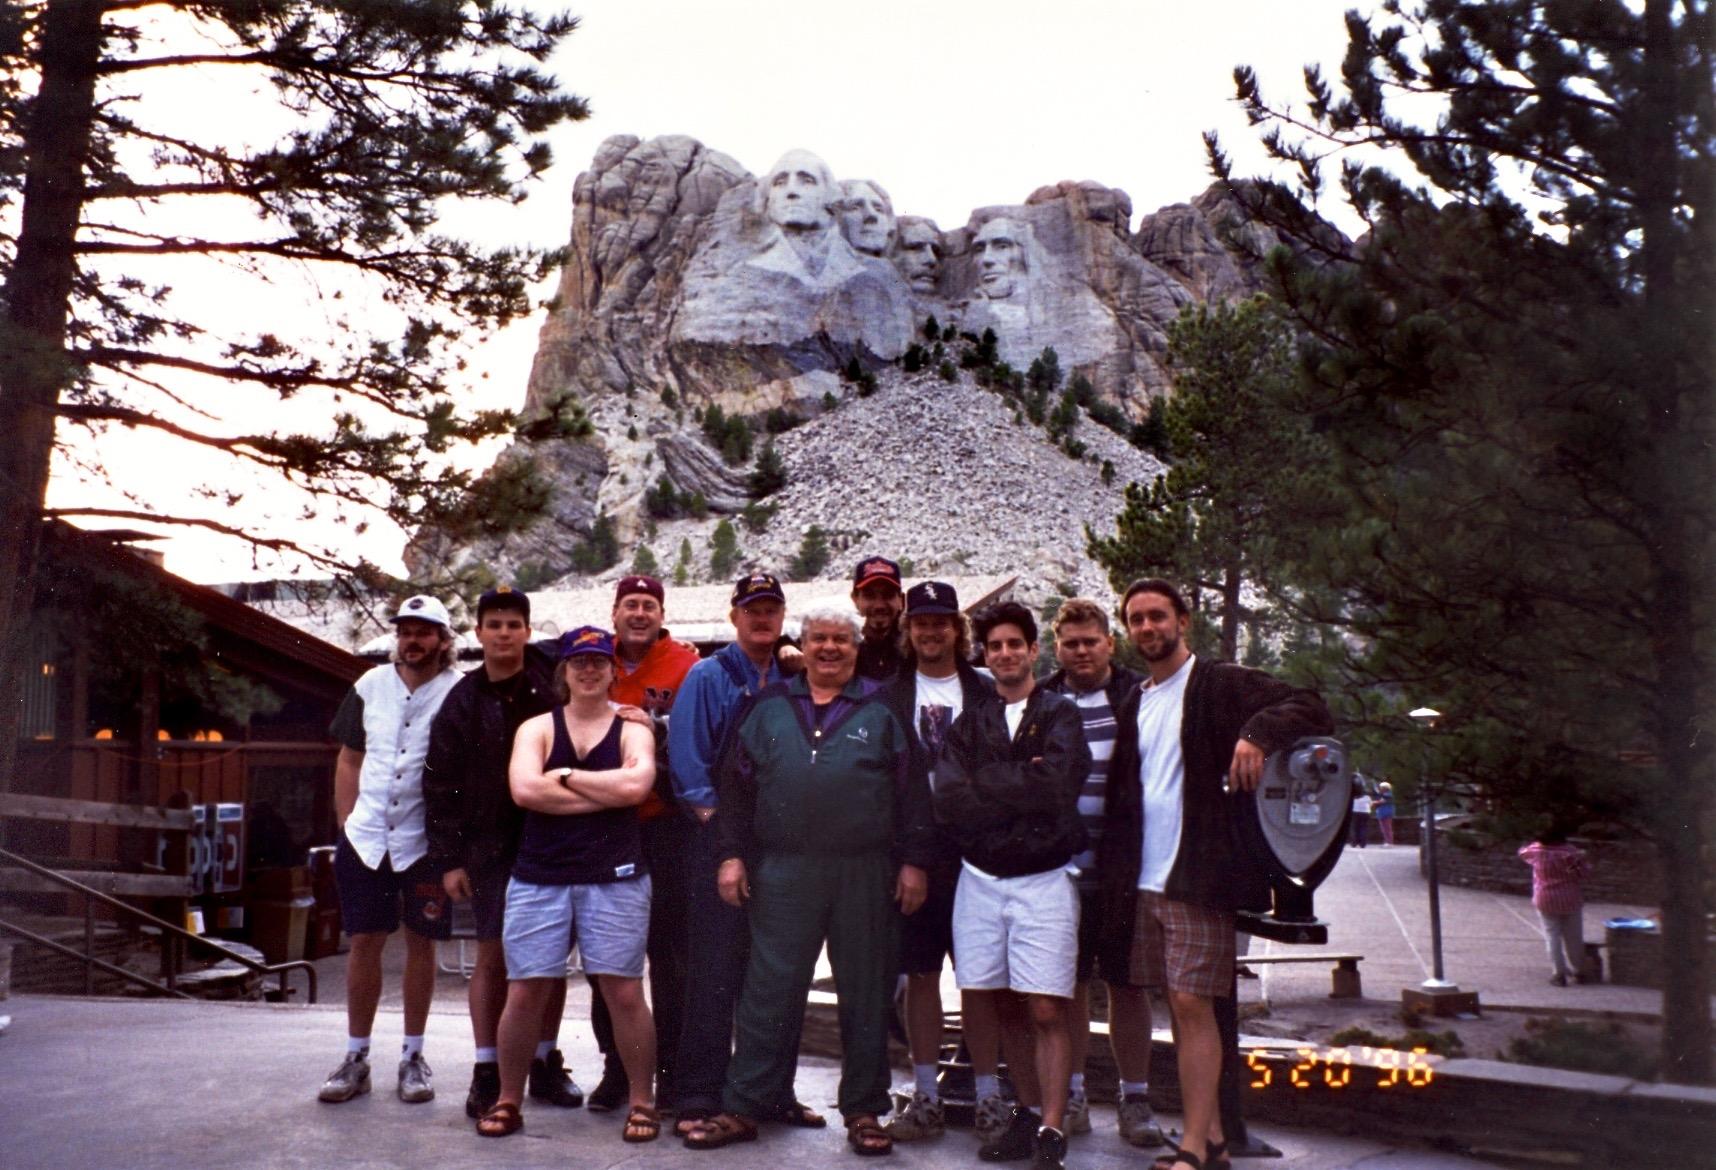 Mt. Rushmore w/ Maynard's band